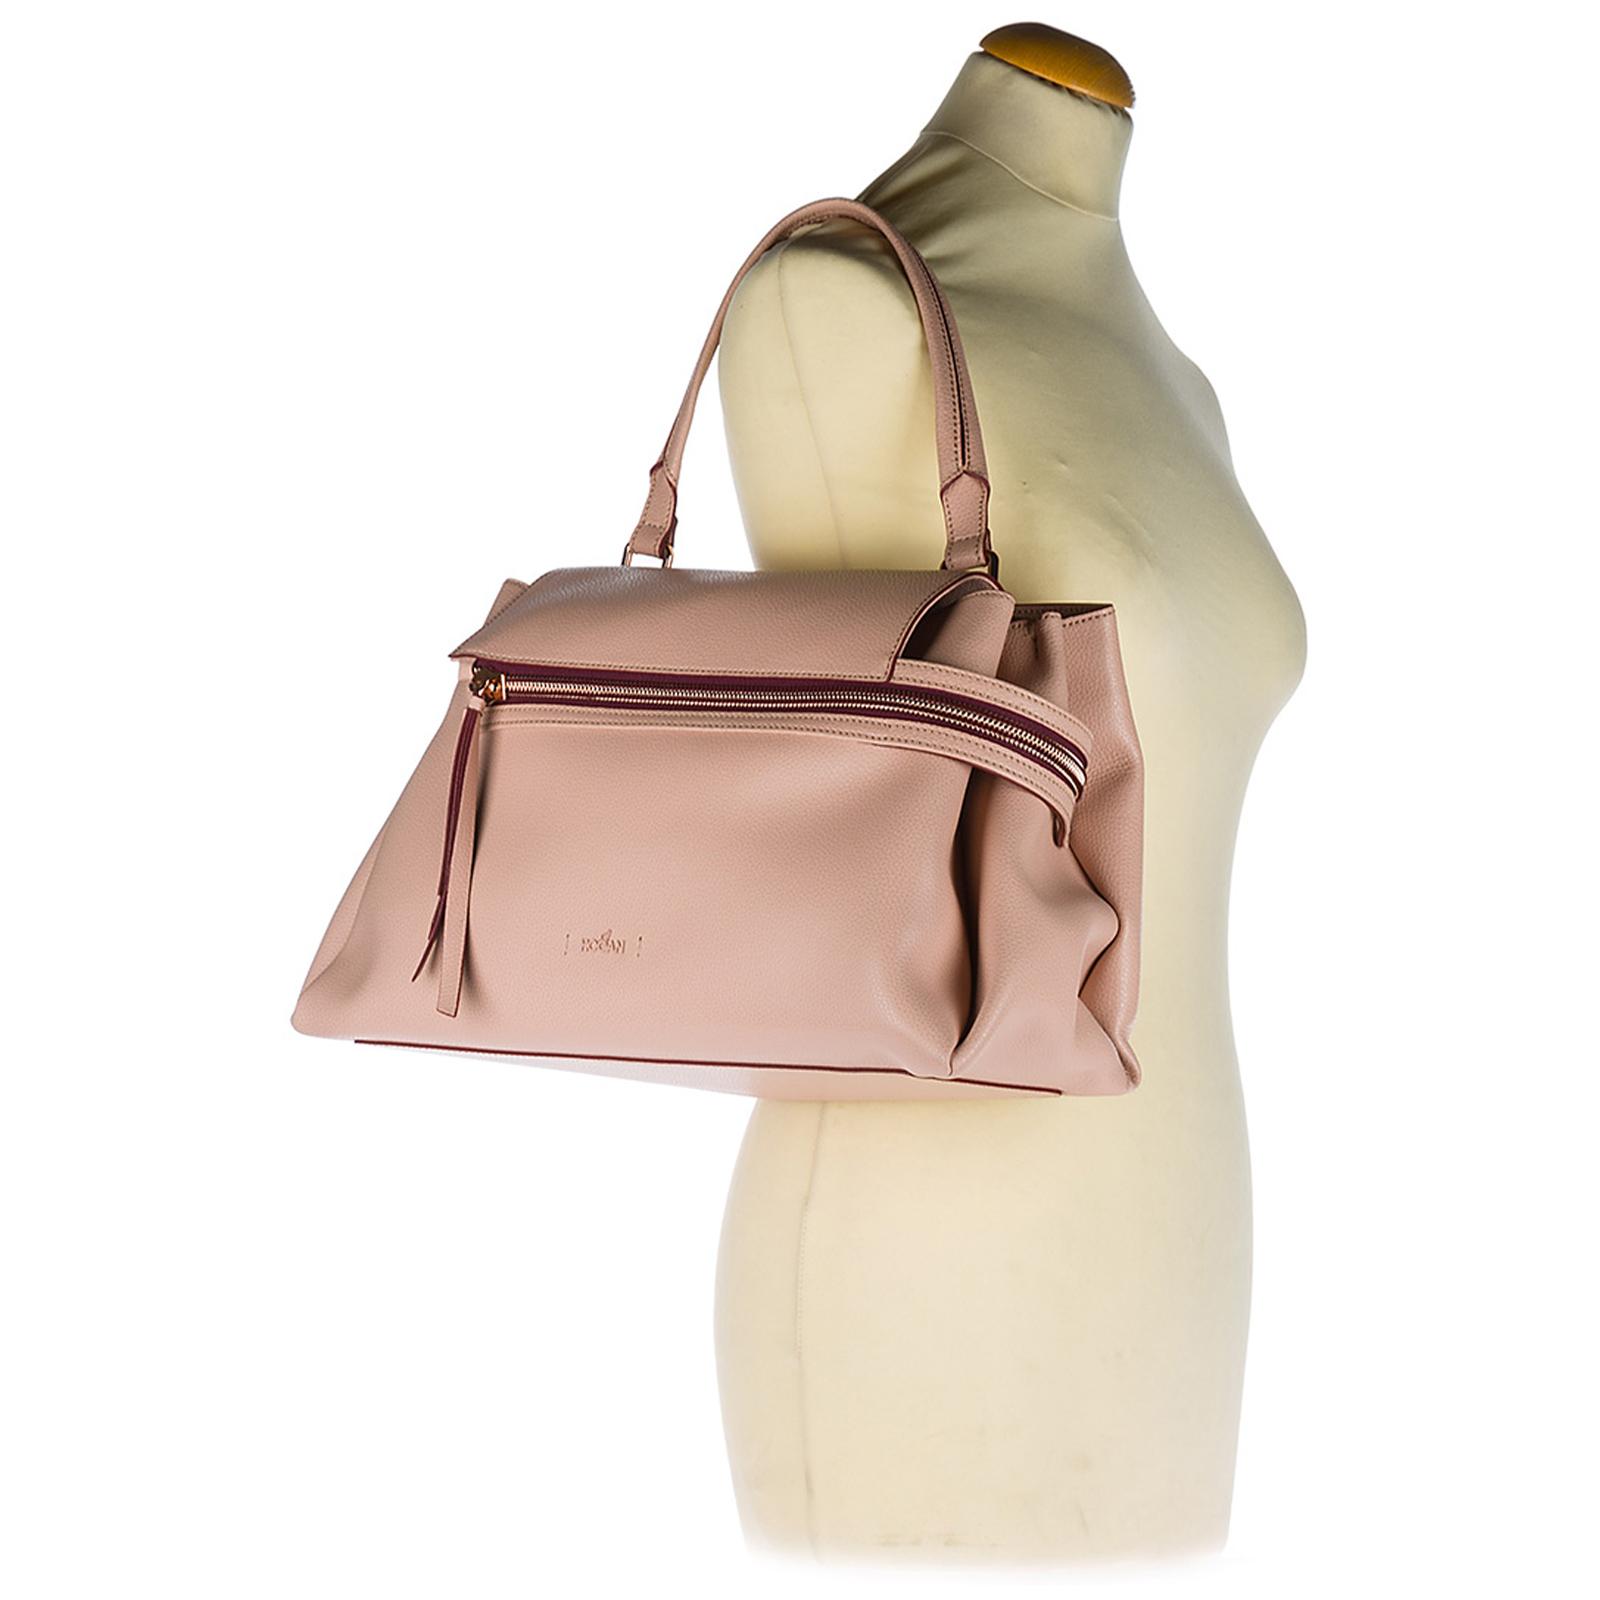 Schultertasche Leder Damen Bag Tasche Umhängetasche Clubbing oBxedC